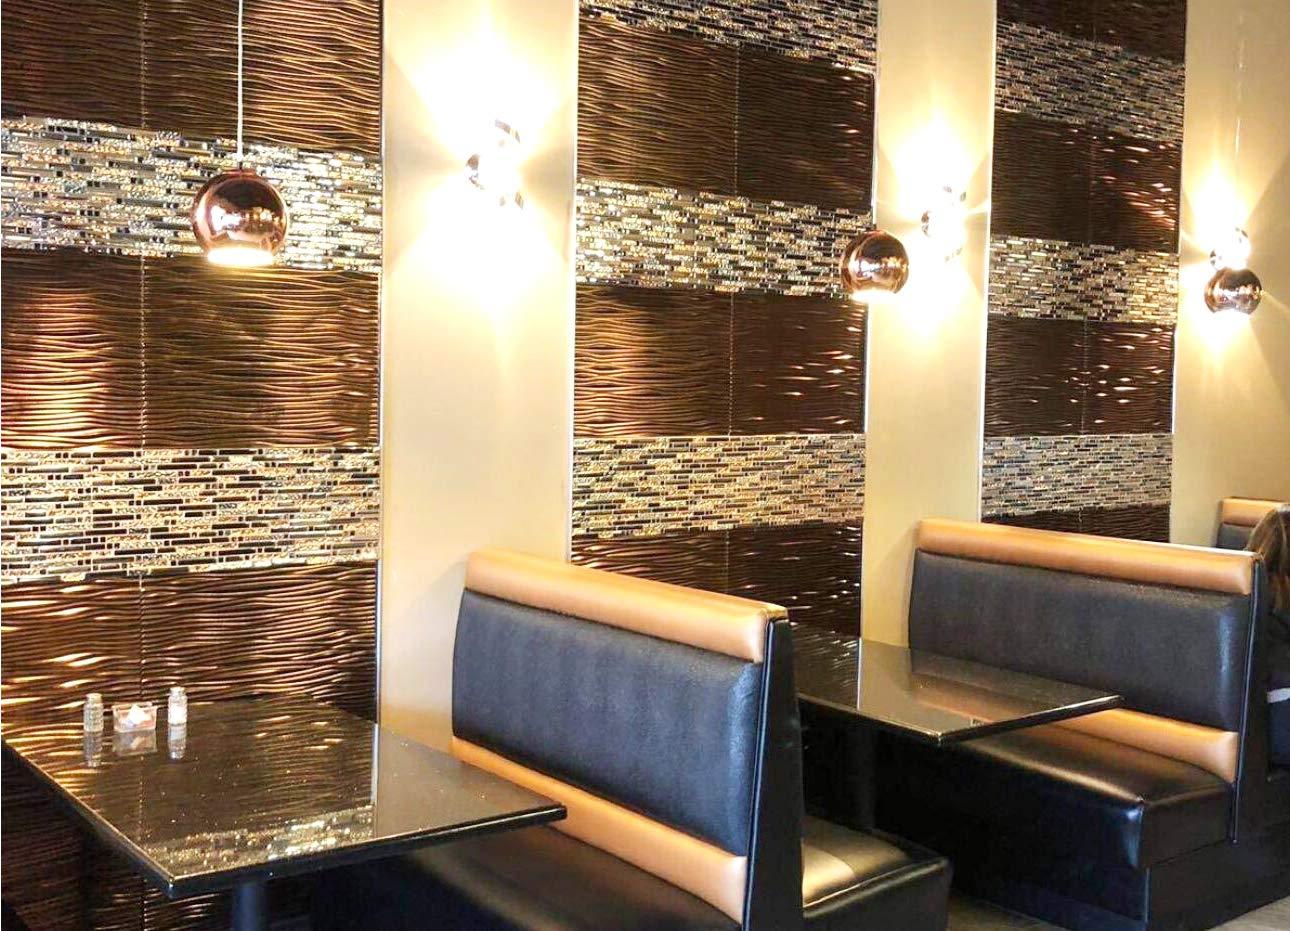 TST Mosaic Tiles Crystal Glass Tile Interlocking Black Brown Mosaic Bath Kitchen Fireplace Decor TSTGT107 (5 PCS [12'' X 12''/Each]) by TST MOSAIC TILES (Image #9)